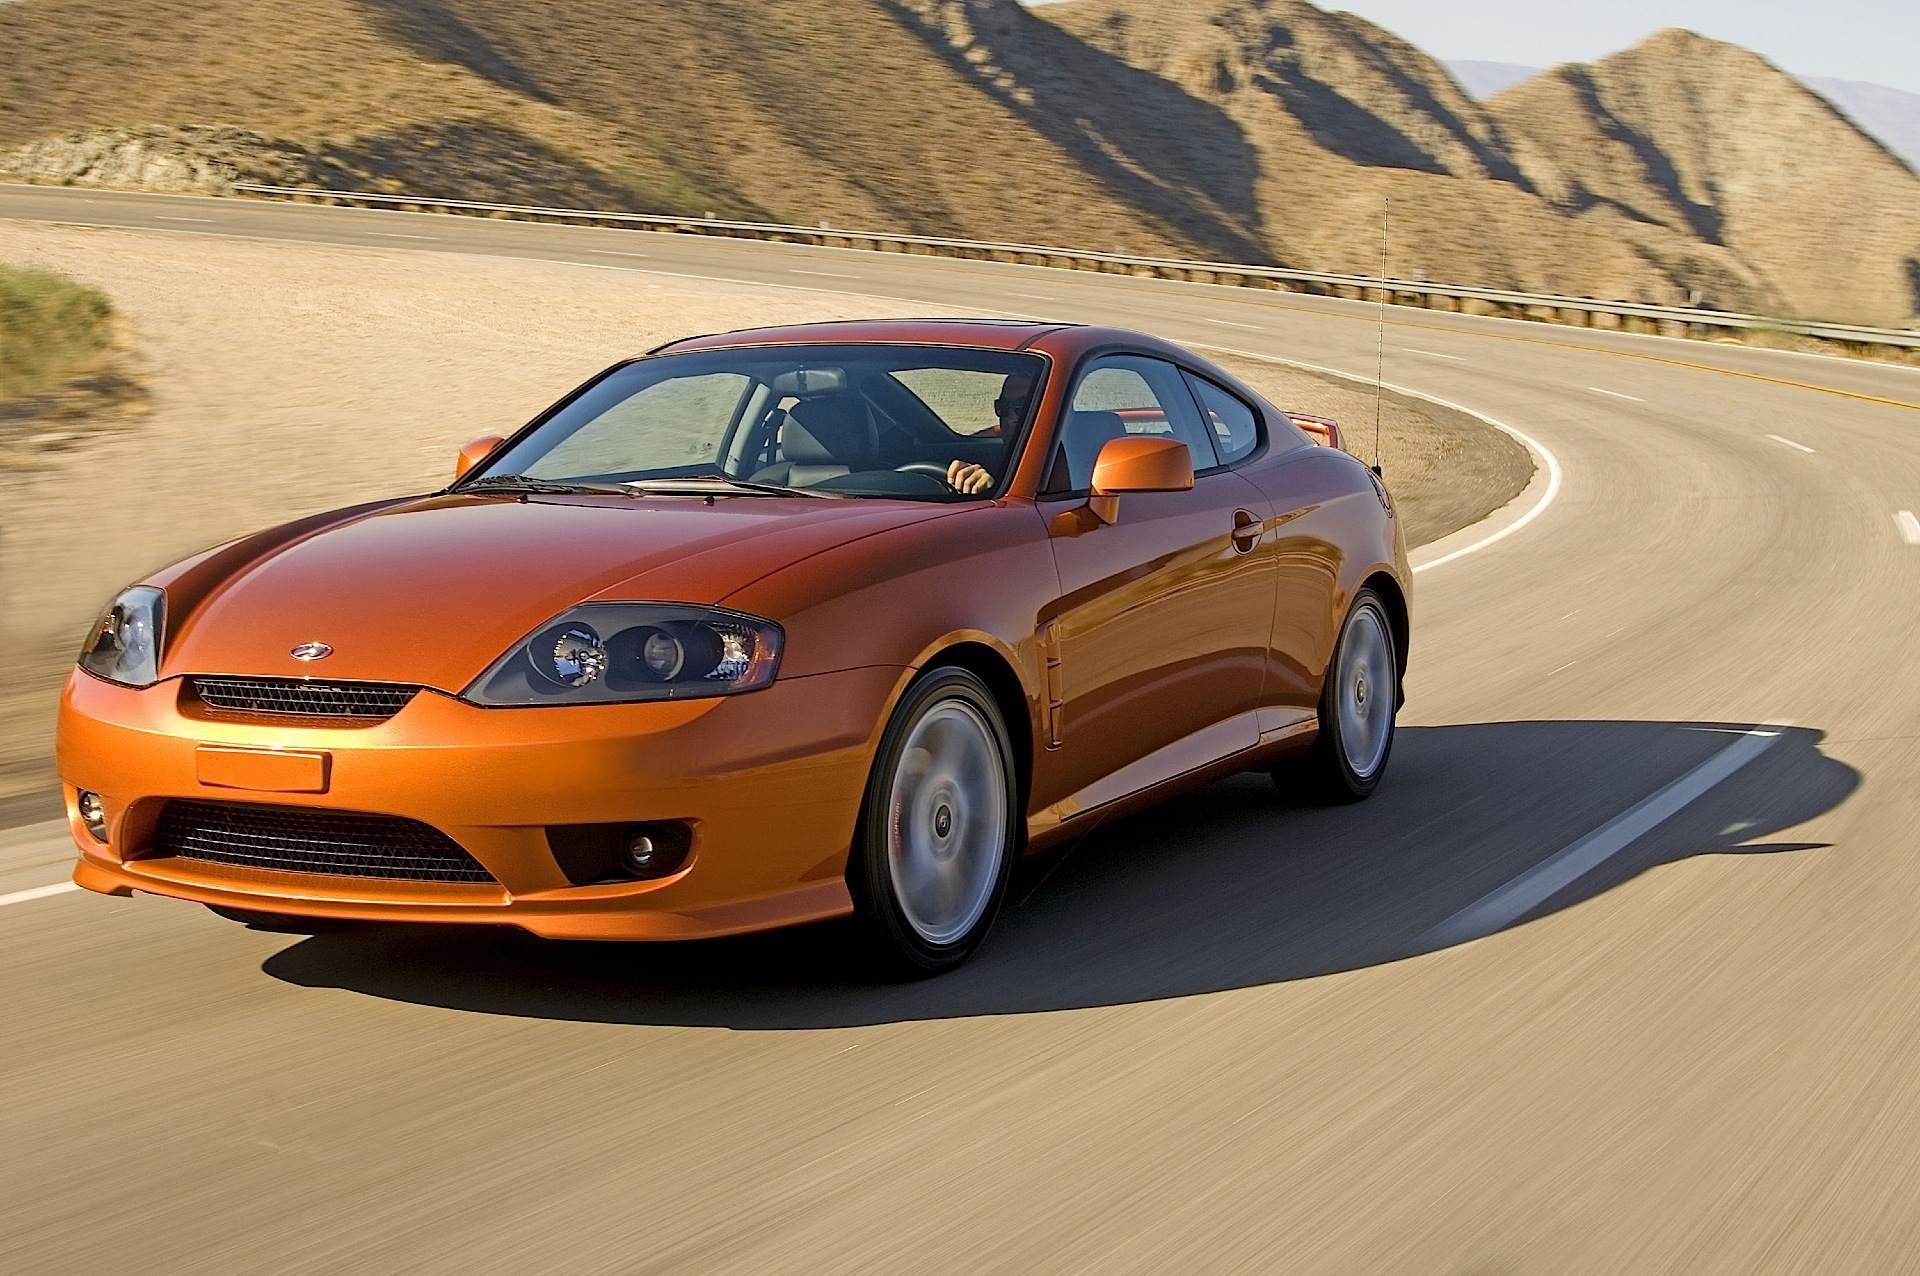 Hyundai Coupe Tiburon 2004 2005 2006 2007